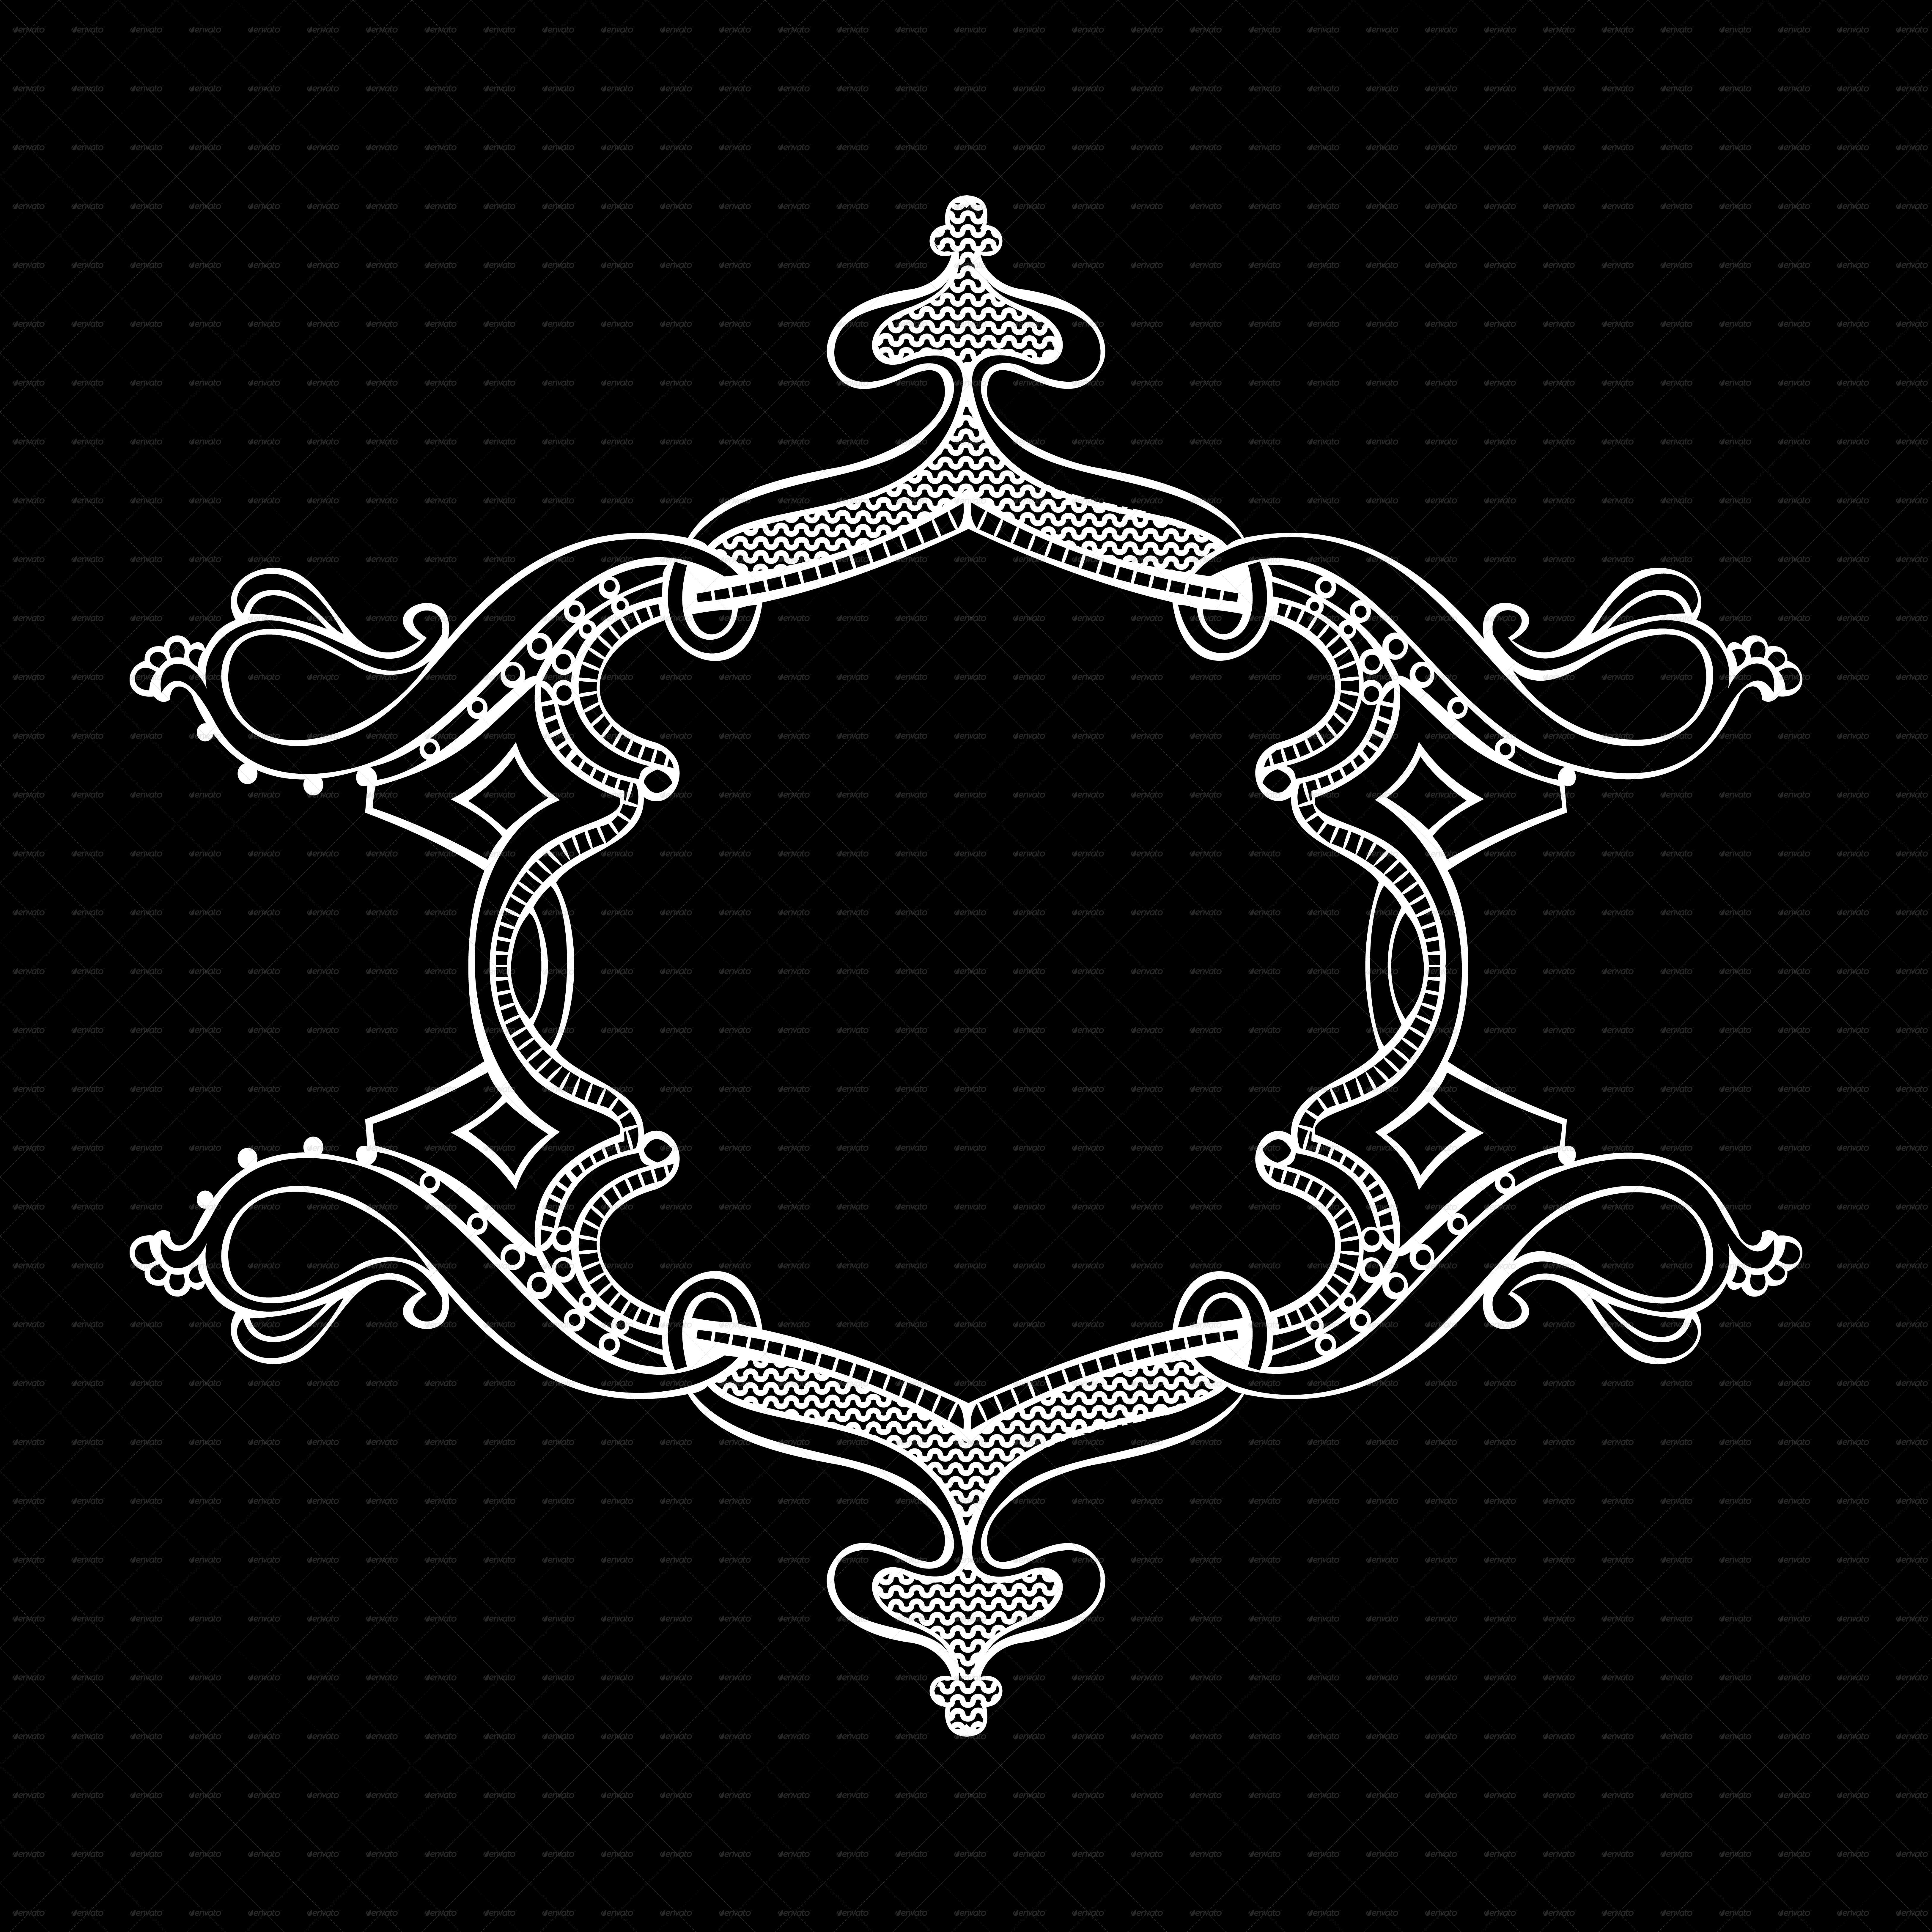 Black And White Ornate Heraldic Art Deco Quad